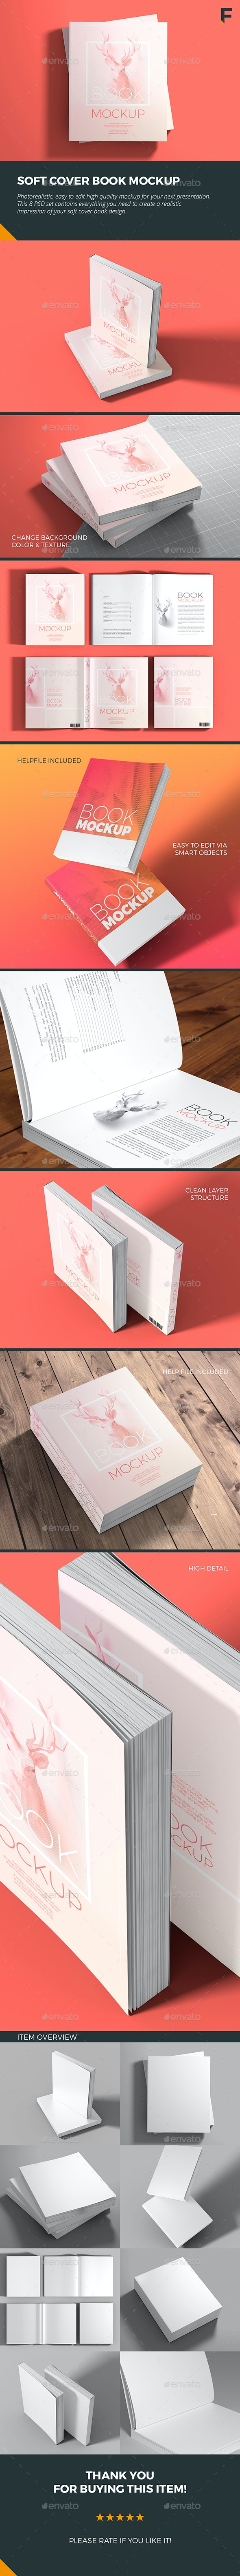 Soft Cover Book Mockup - Books Print